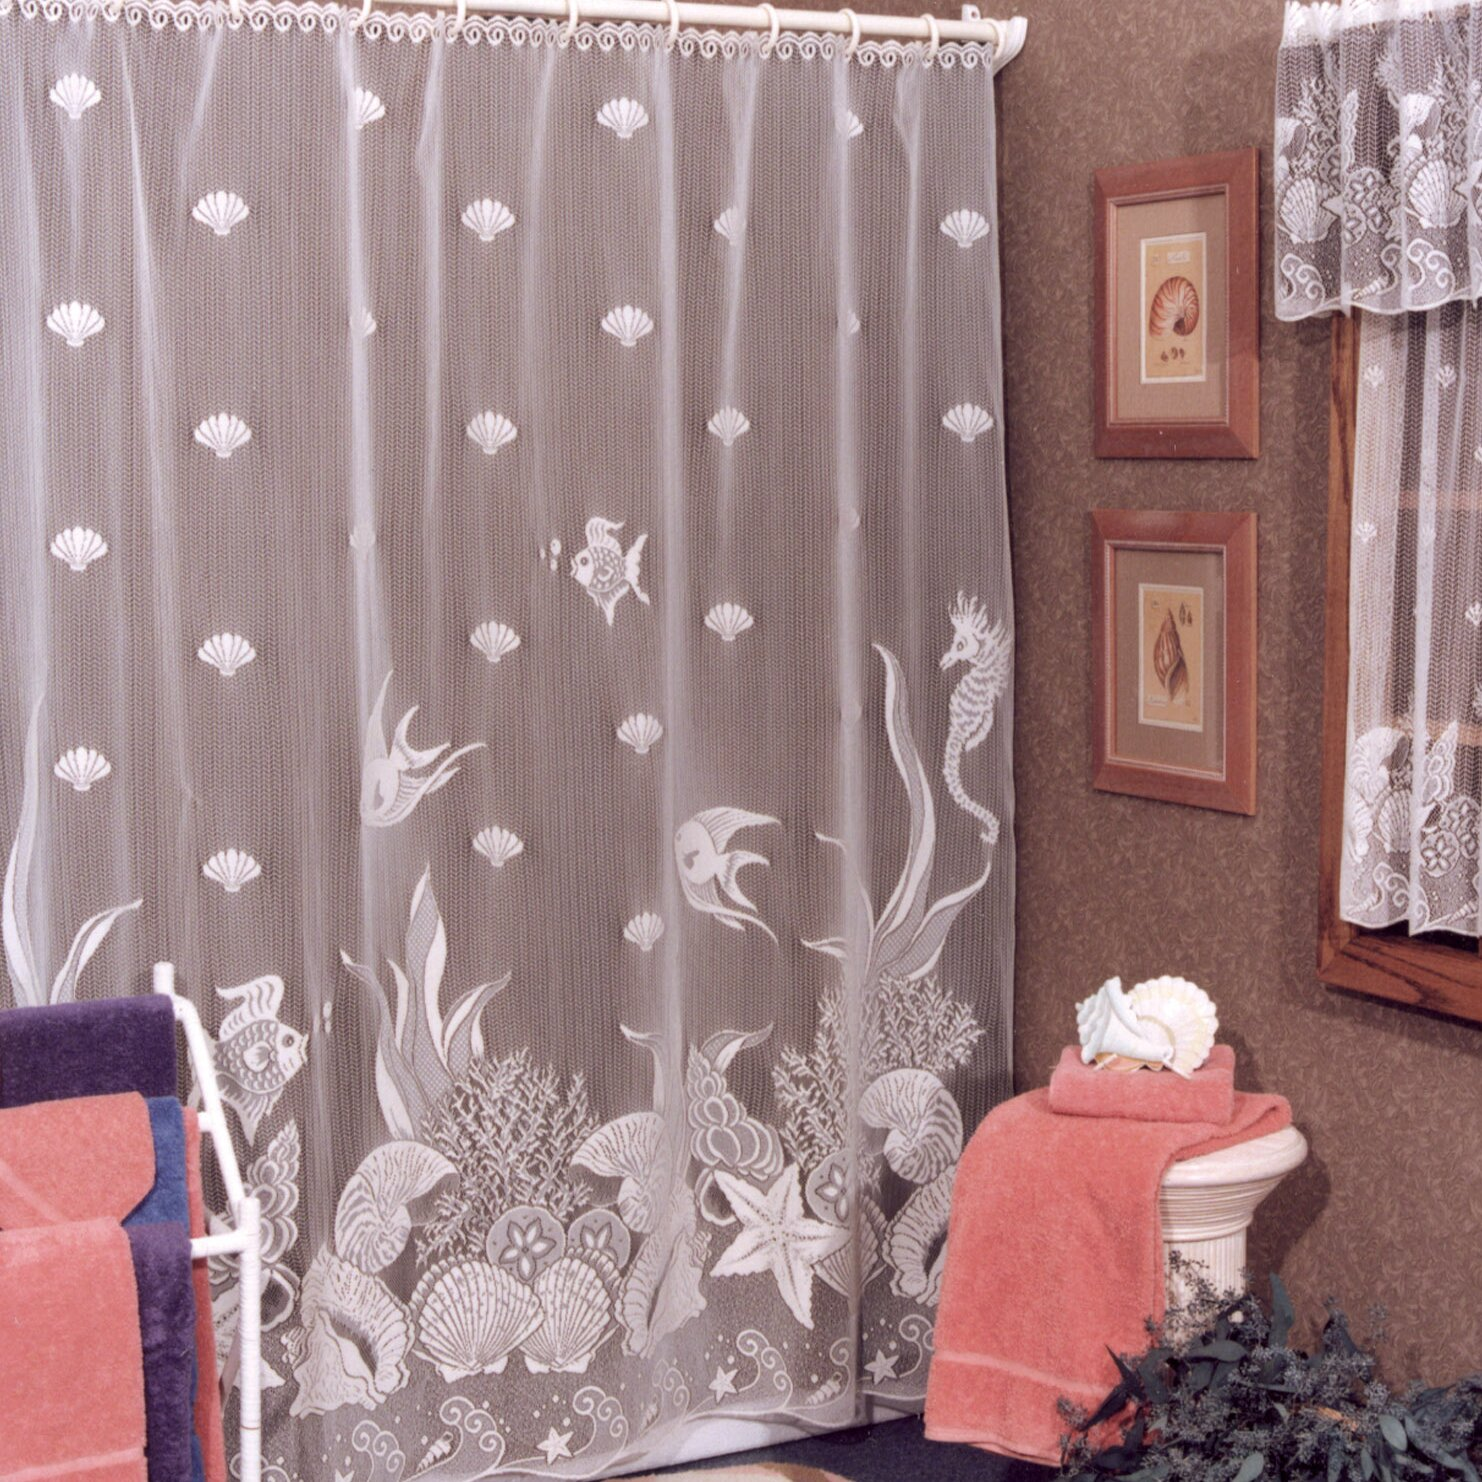 Vinyl Christmas Shower Curtain